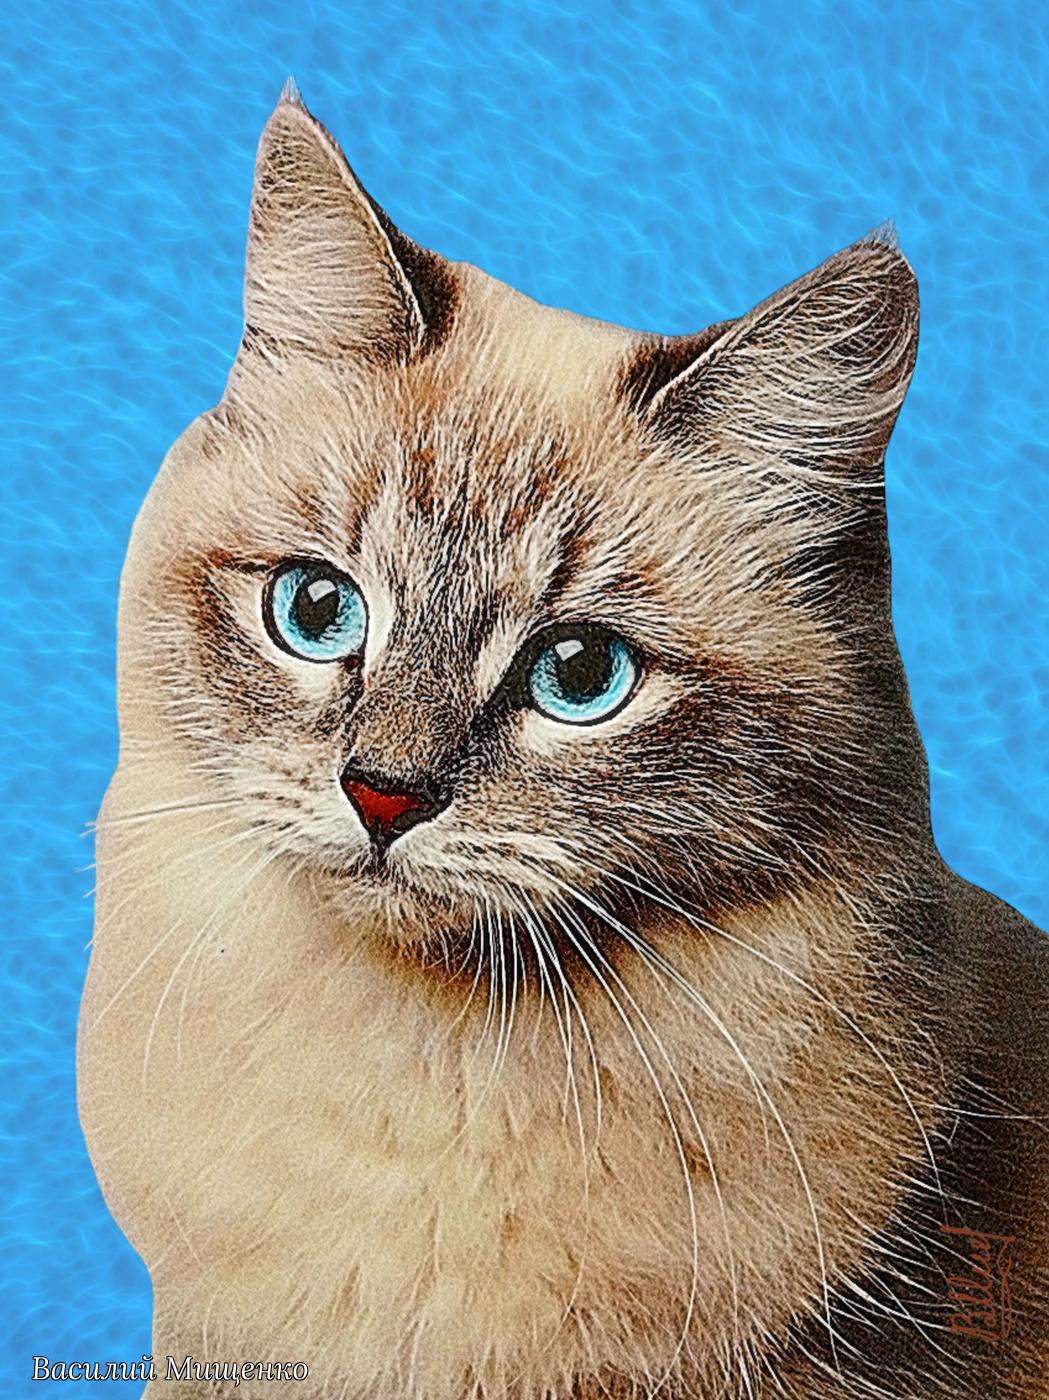 Vasiliy Mishchenko. Кошка с глубыми глазами